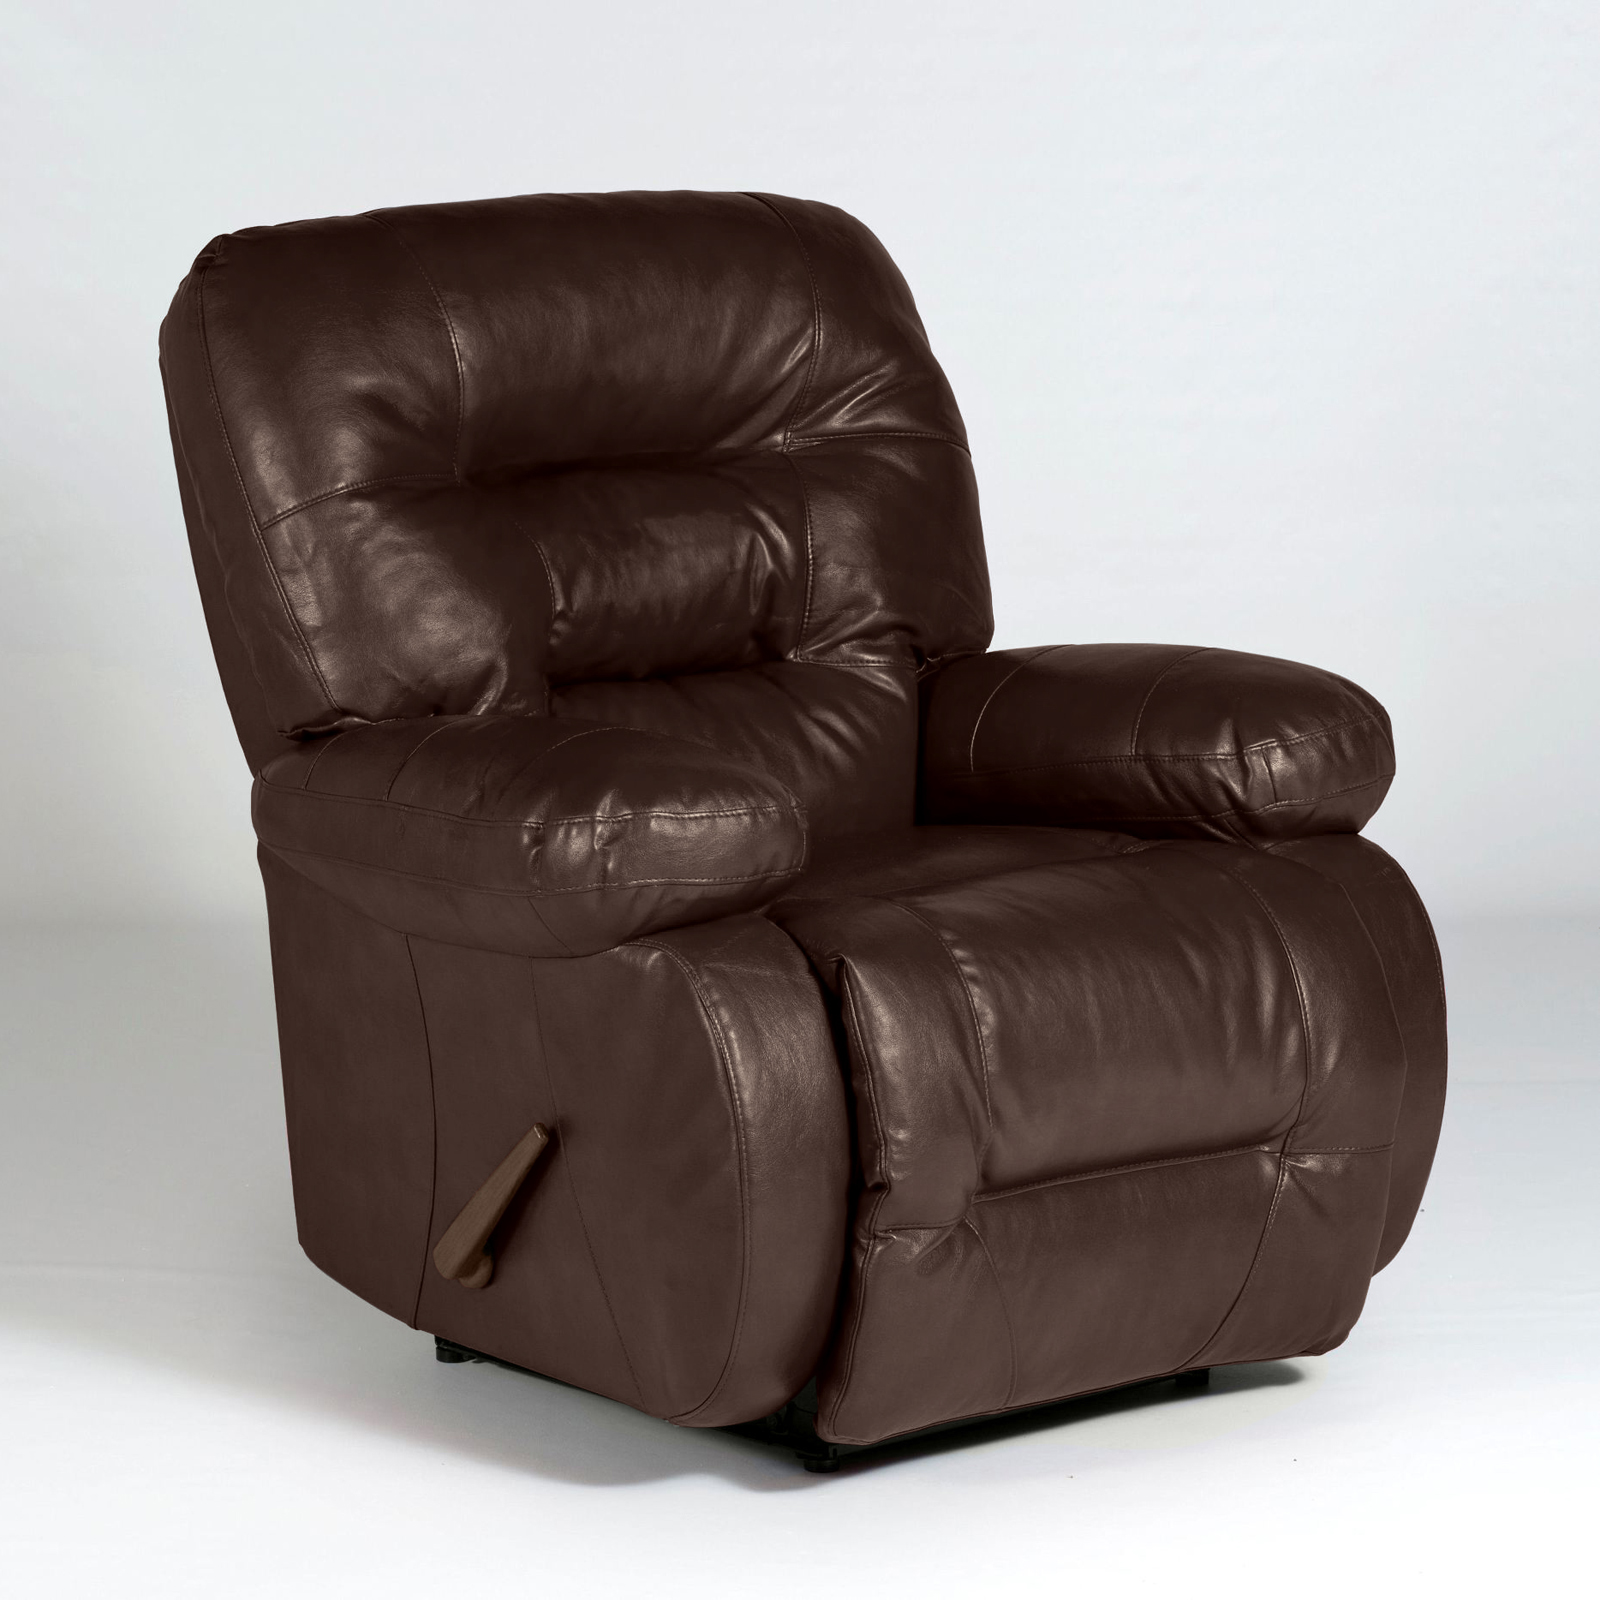 perfect sleep chair recliner pads under legs best home furnishings bradley rocker